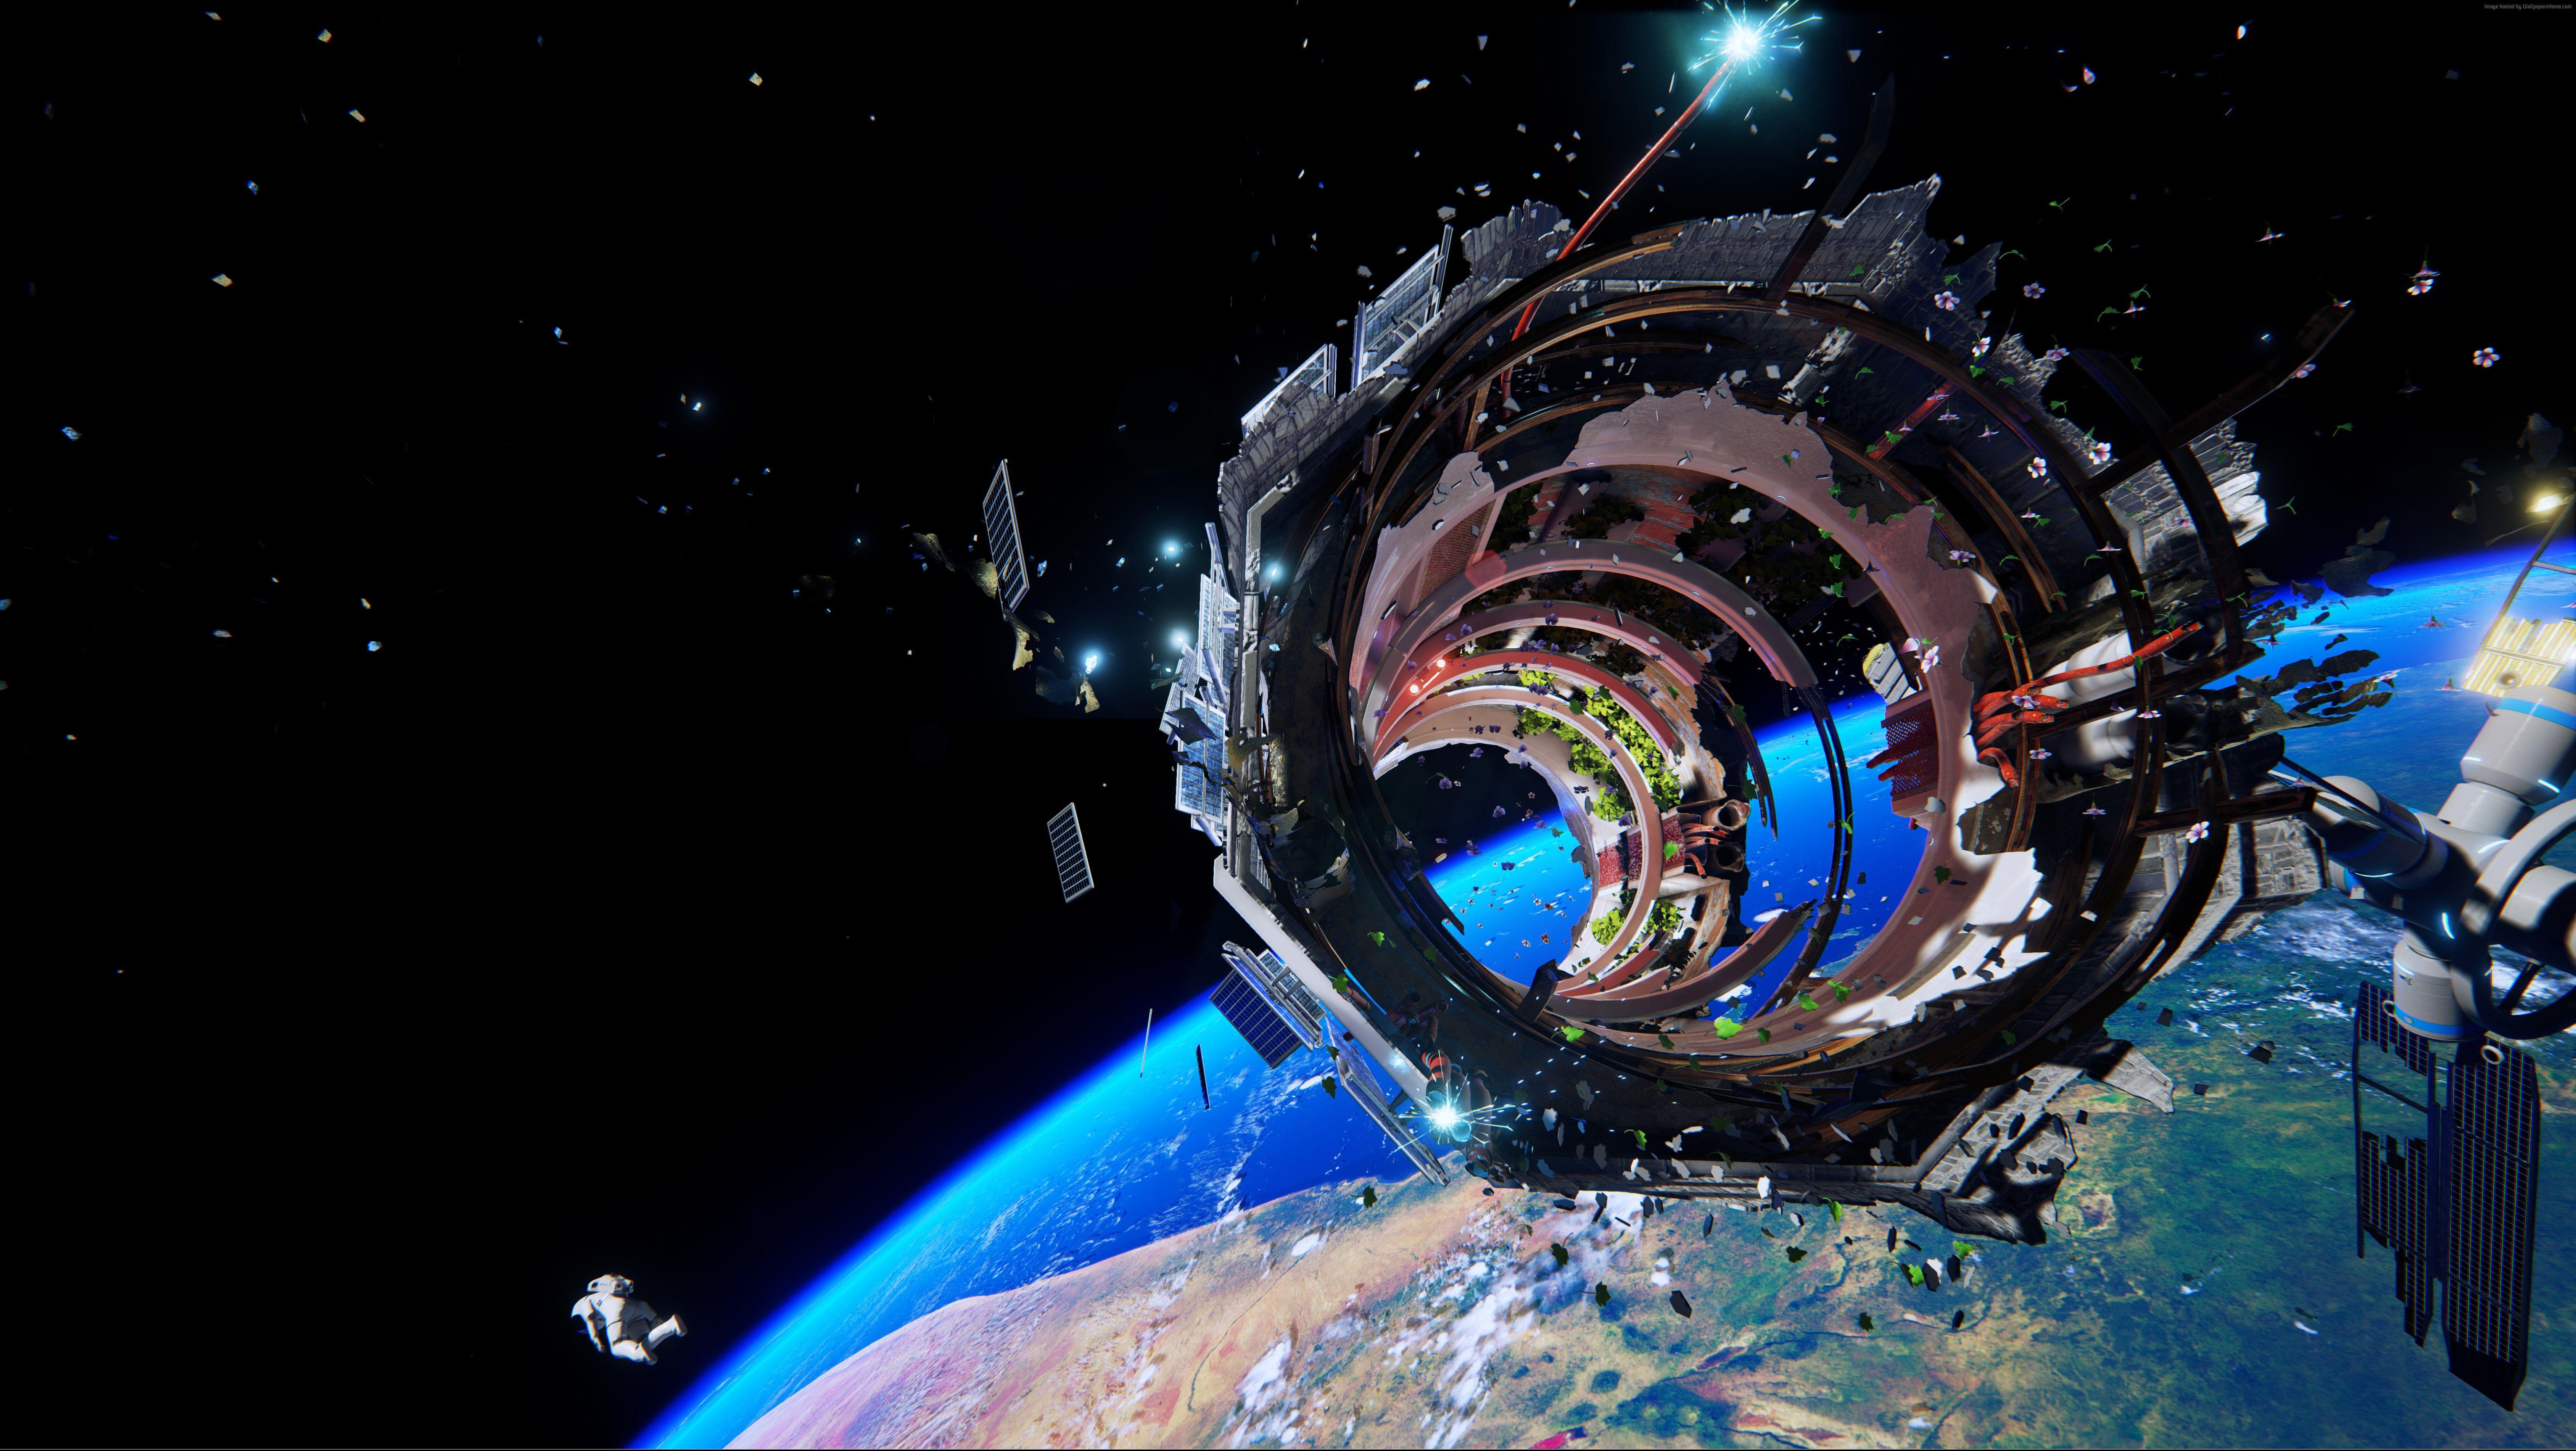 spaceship - Google Търсене